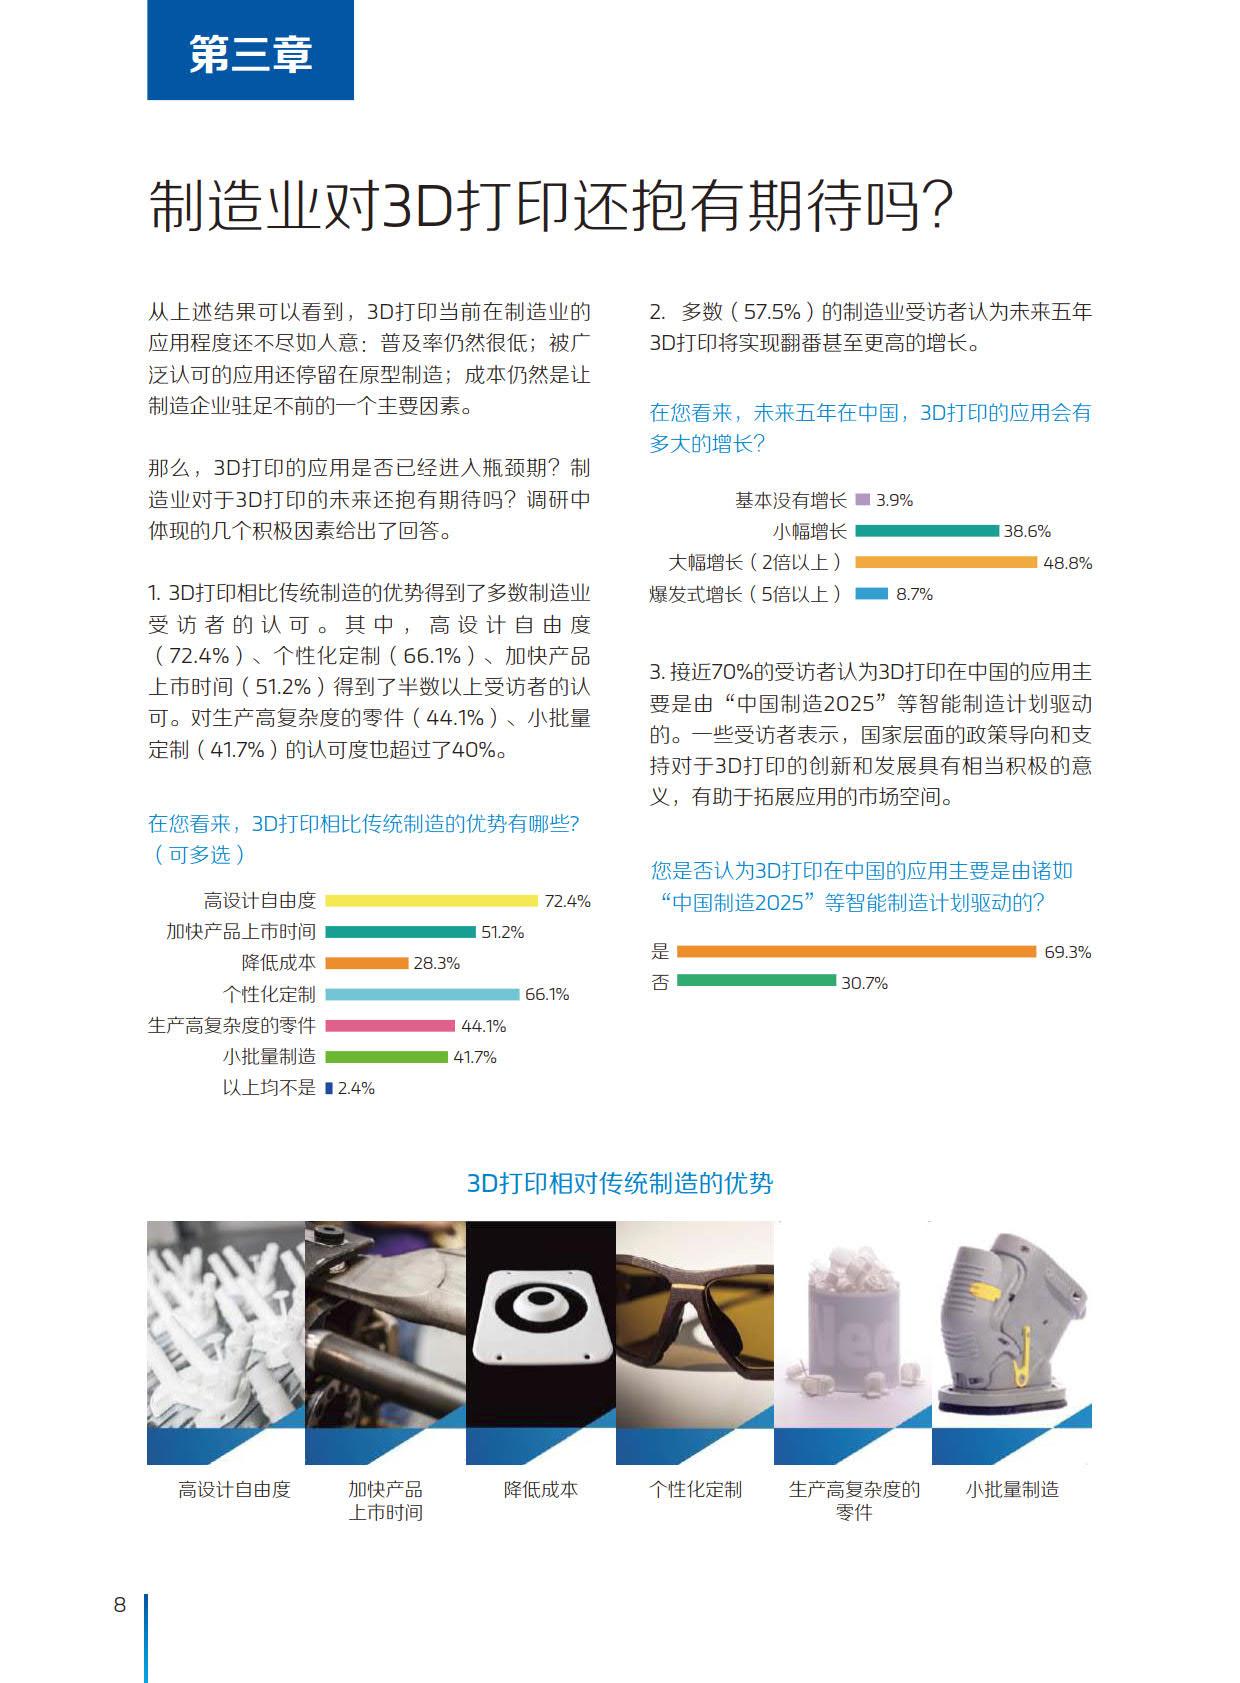 Materialise制造业调研报告_8.jpg